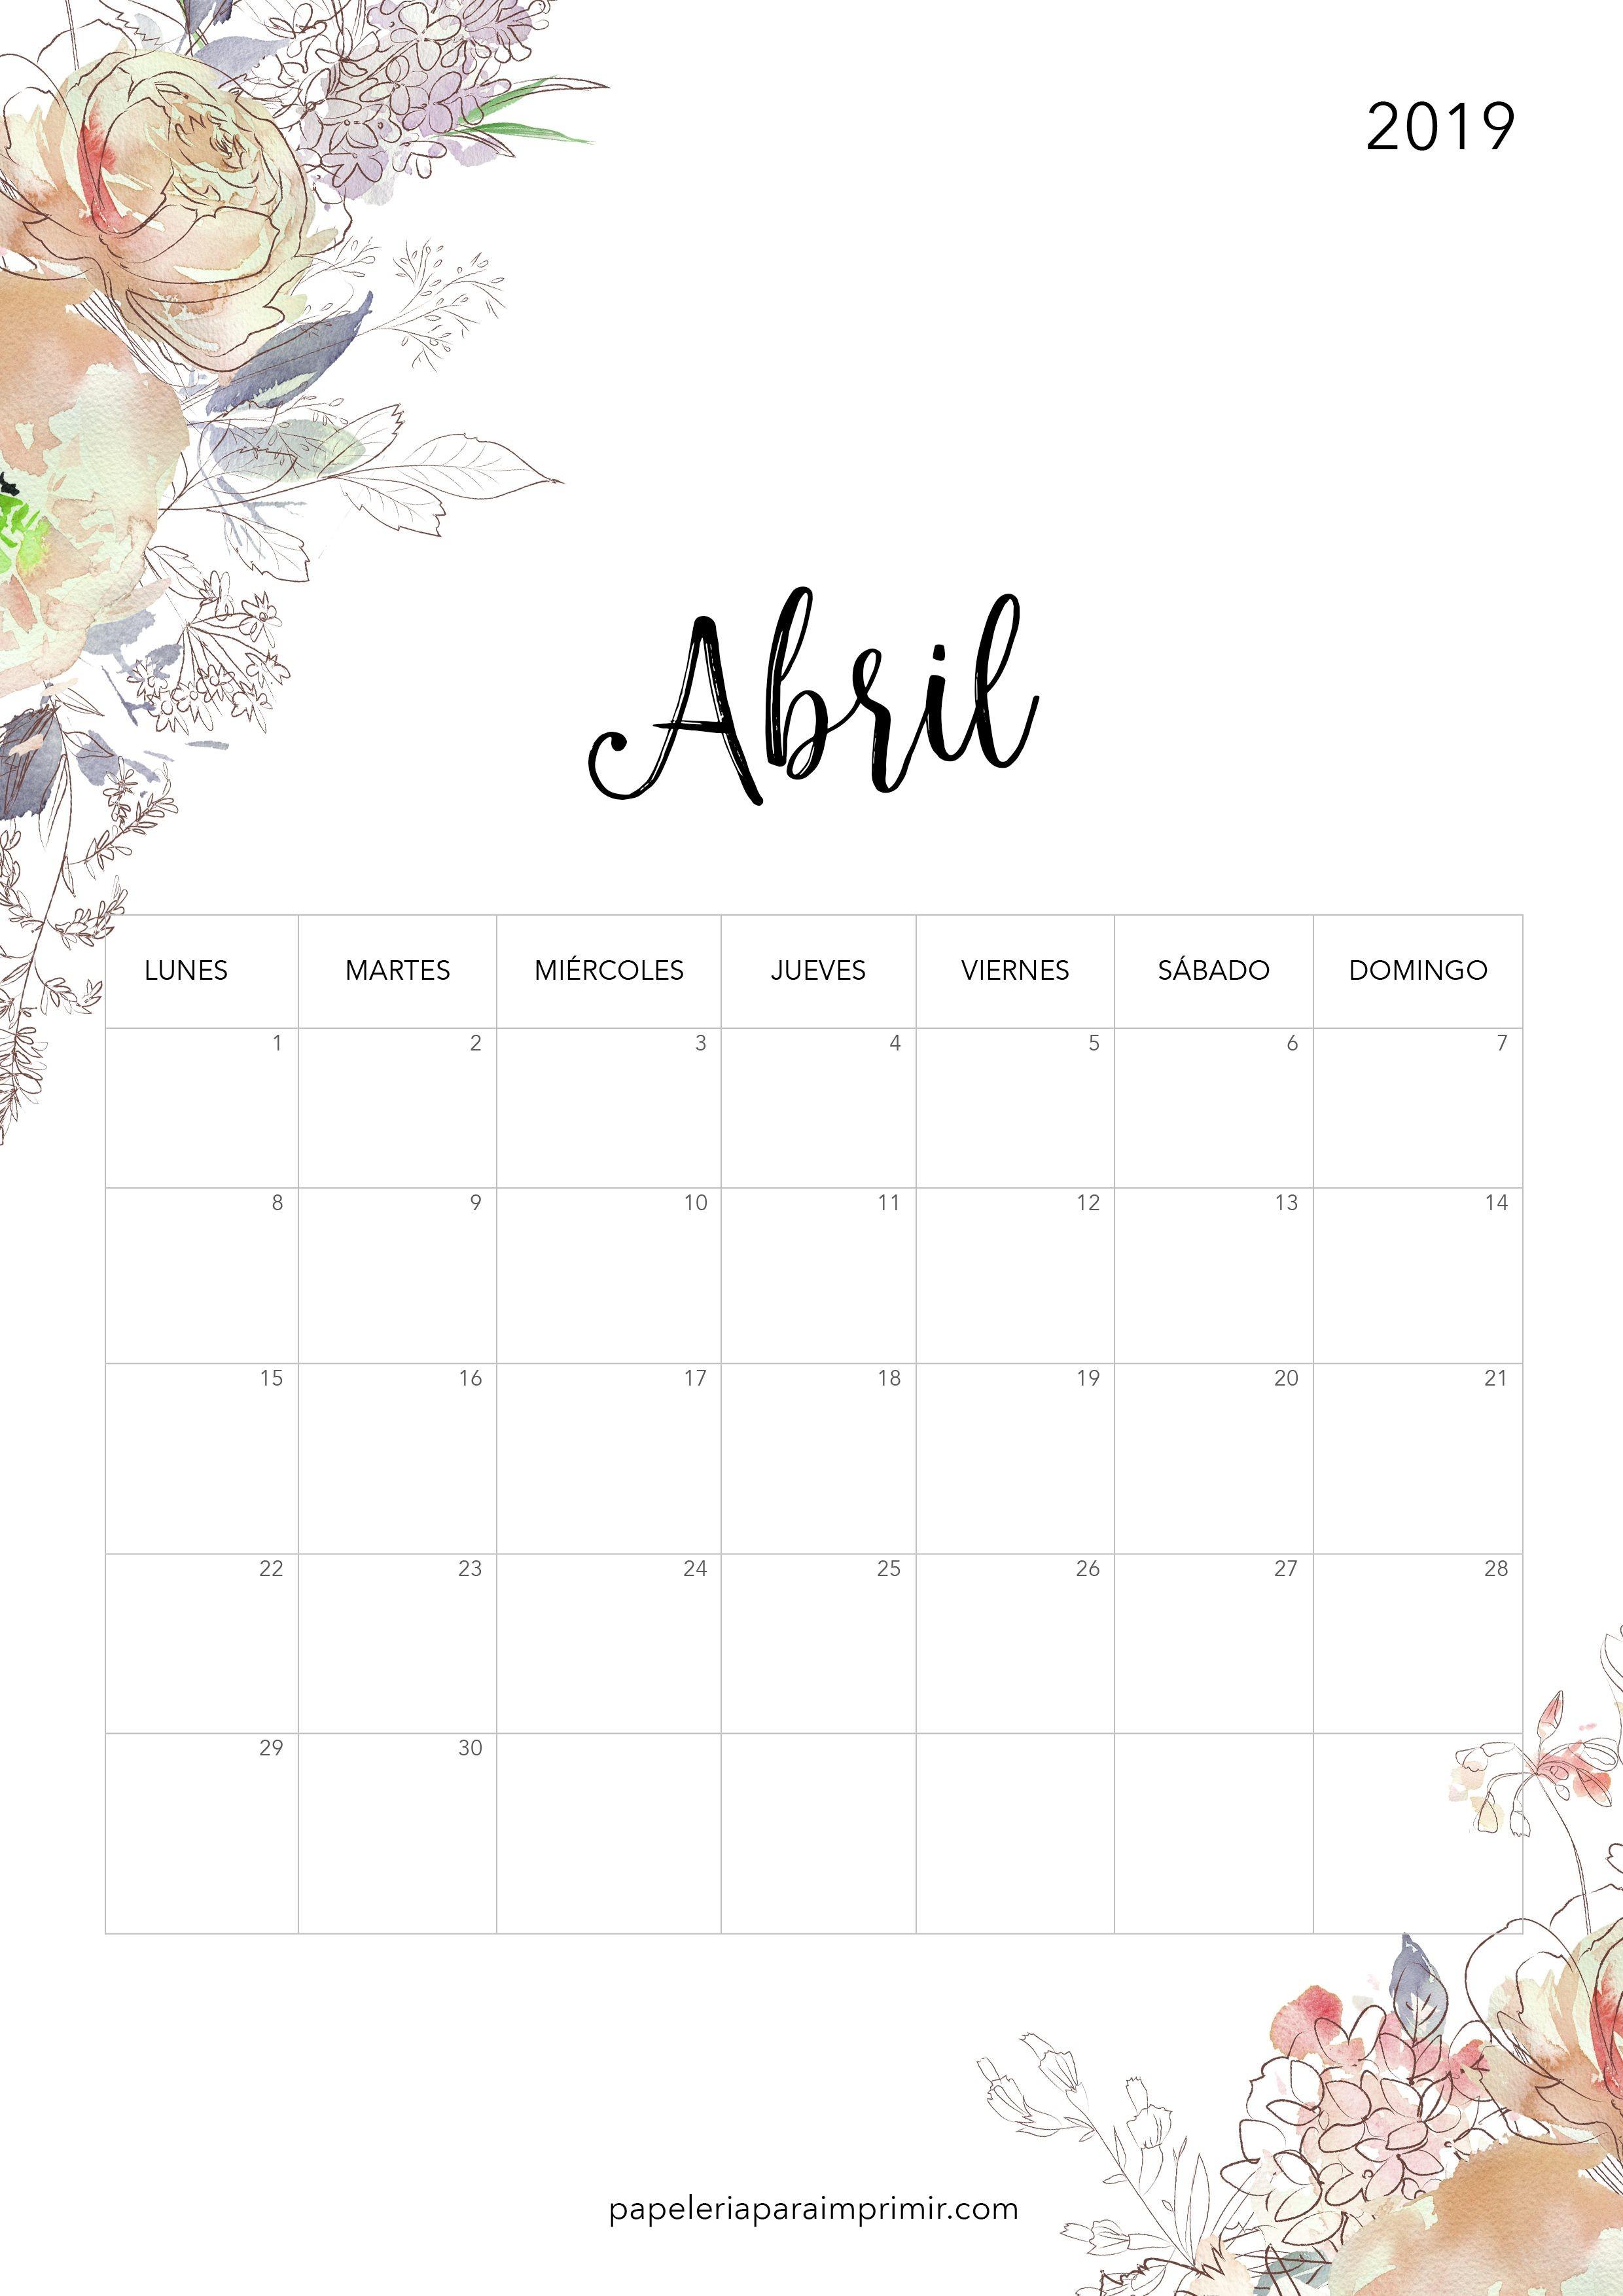 Calendario Abril 2019 Para Imprimir Pdf Recientes Calendario Para Imprimir 2019 Abril Calendario Imprimir Of Calendario Abril 2019 Para Imprimir Pdf Más Actual 2020 2021 Calendar Printable Template